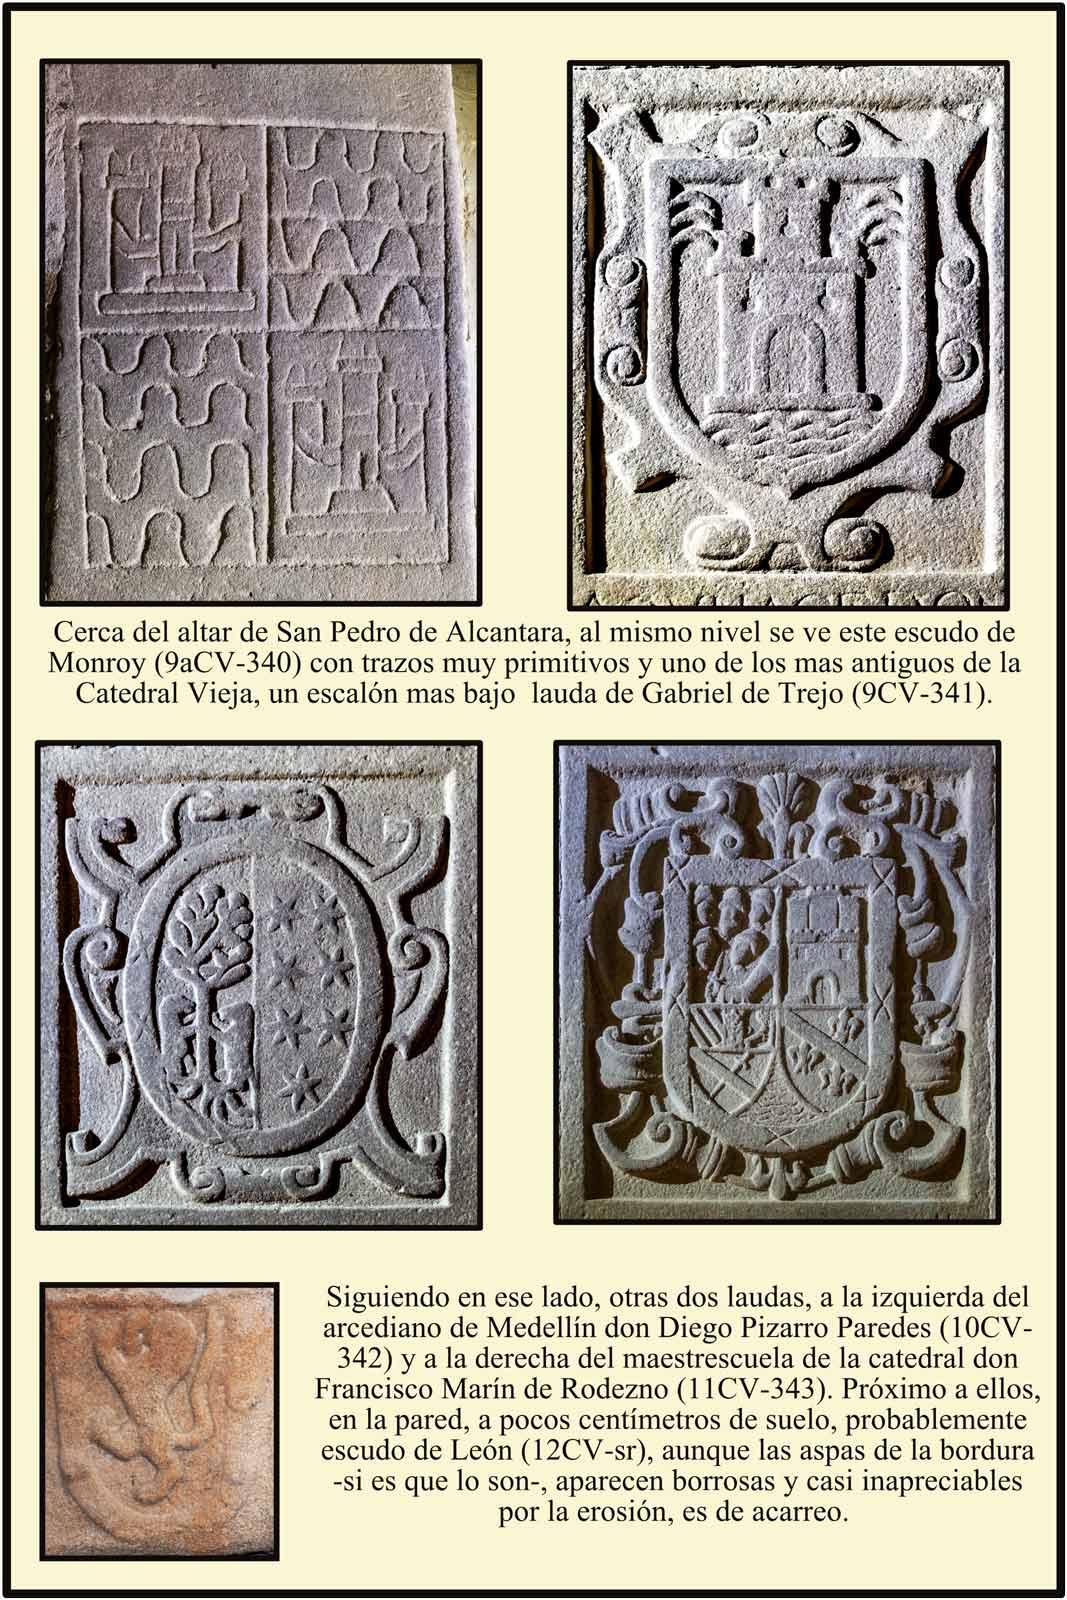 Suelo catedral plasencia laudas escudos Monroy Trejo Pizarro Martin de Rodezno Leon